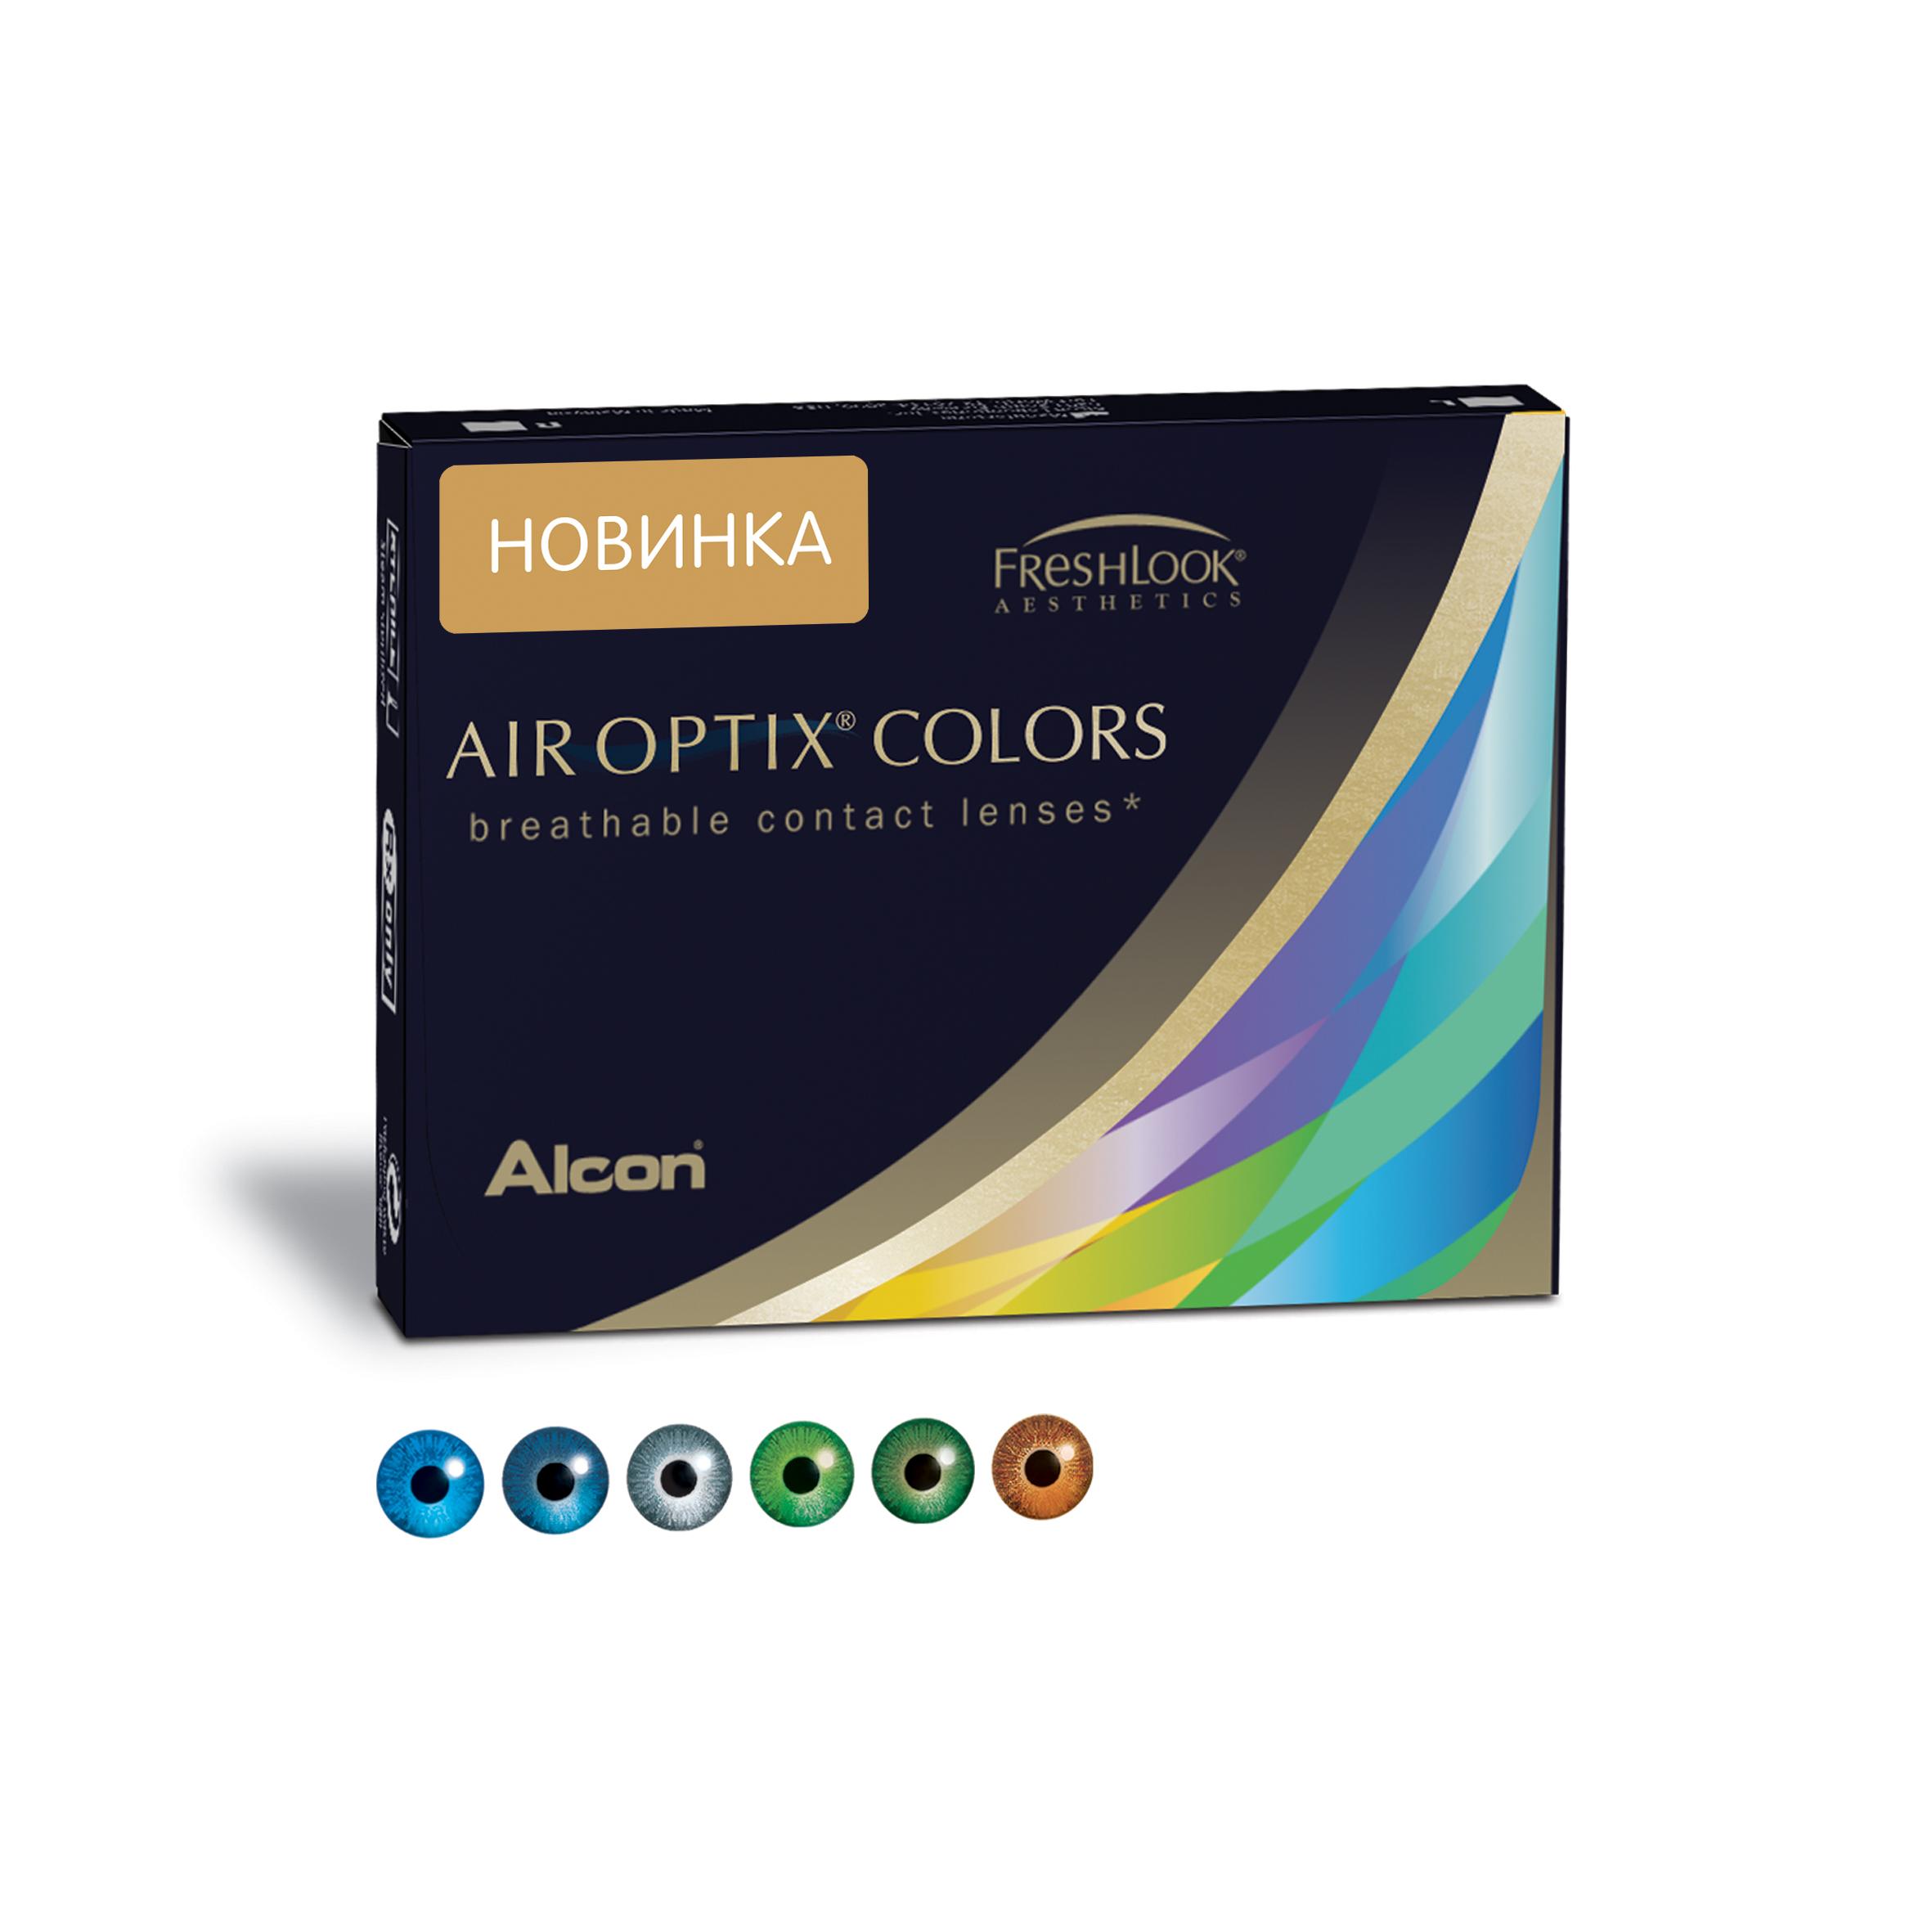 Аlcon контактные линзы Air Optix Colors 2 шт -0.50 Sterling Gray31746111Мягкие контактные линзы